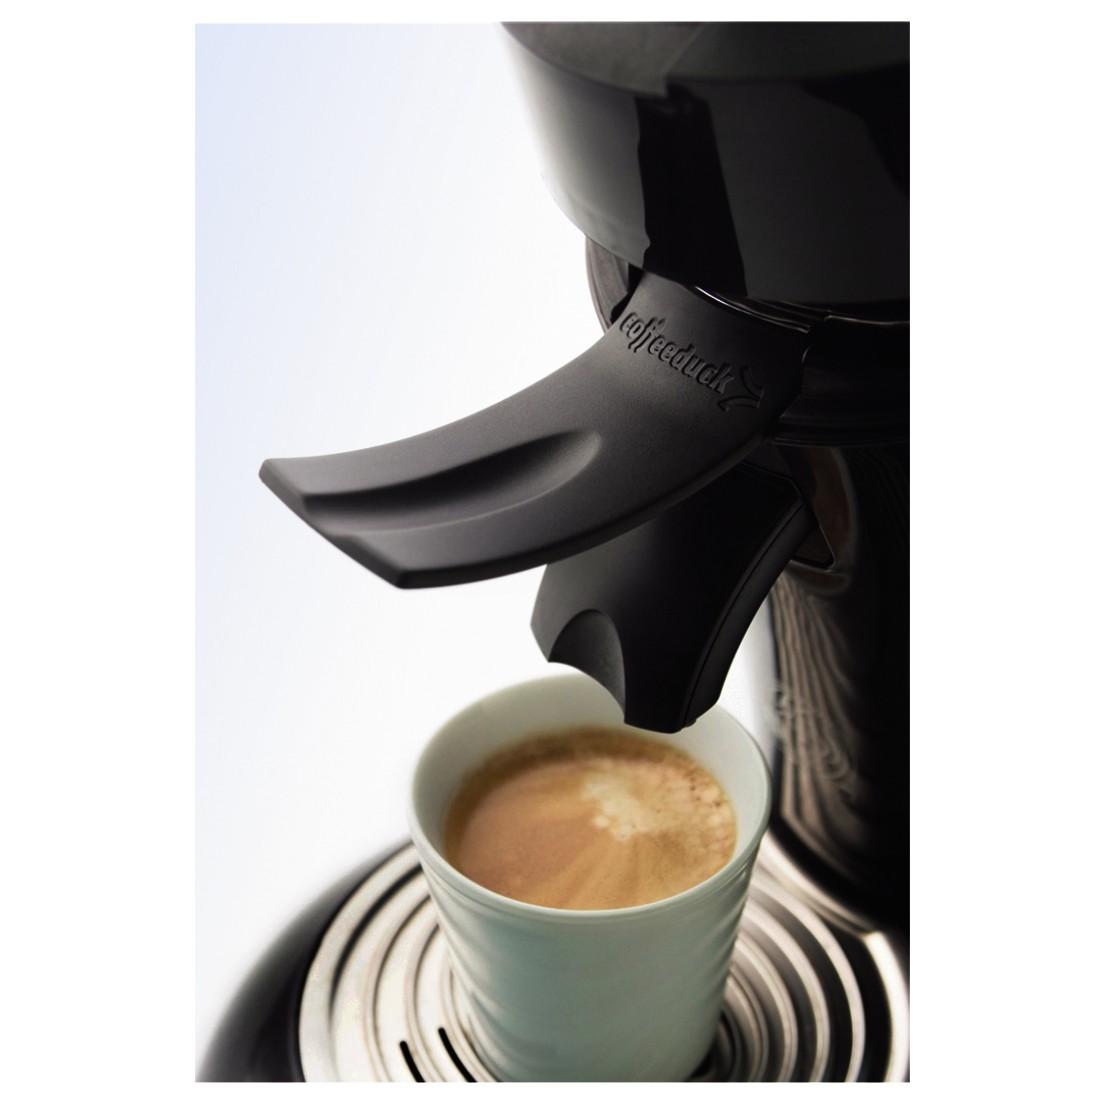 00111056 xavax kaffeefilter coffeeduck f r senseo classic. Black Bedroom Furniture Sets. Home Design Ideas